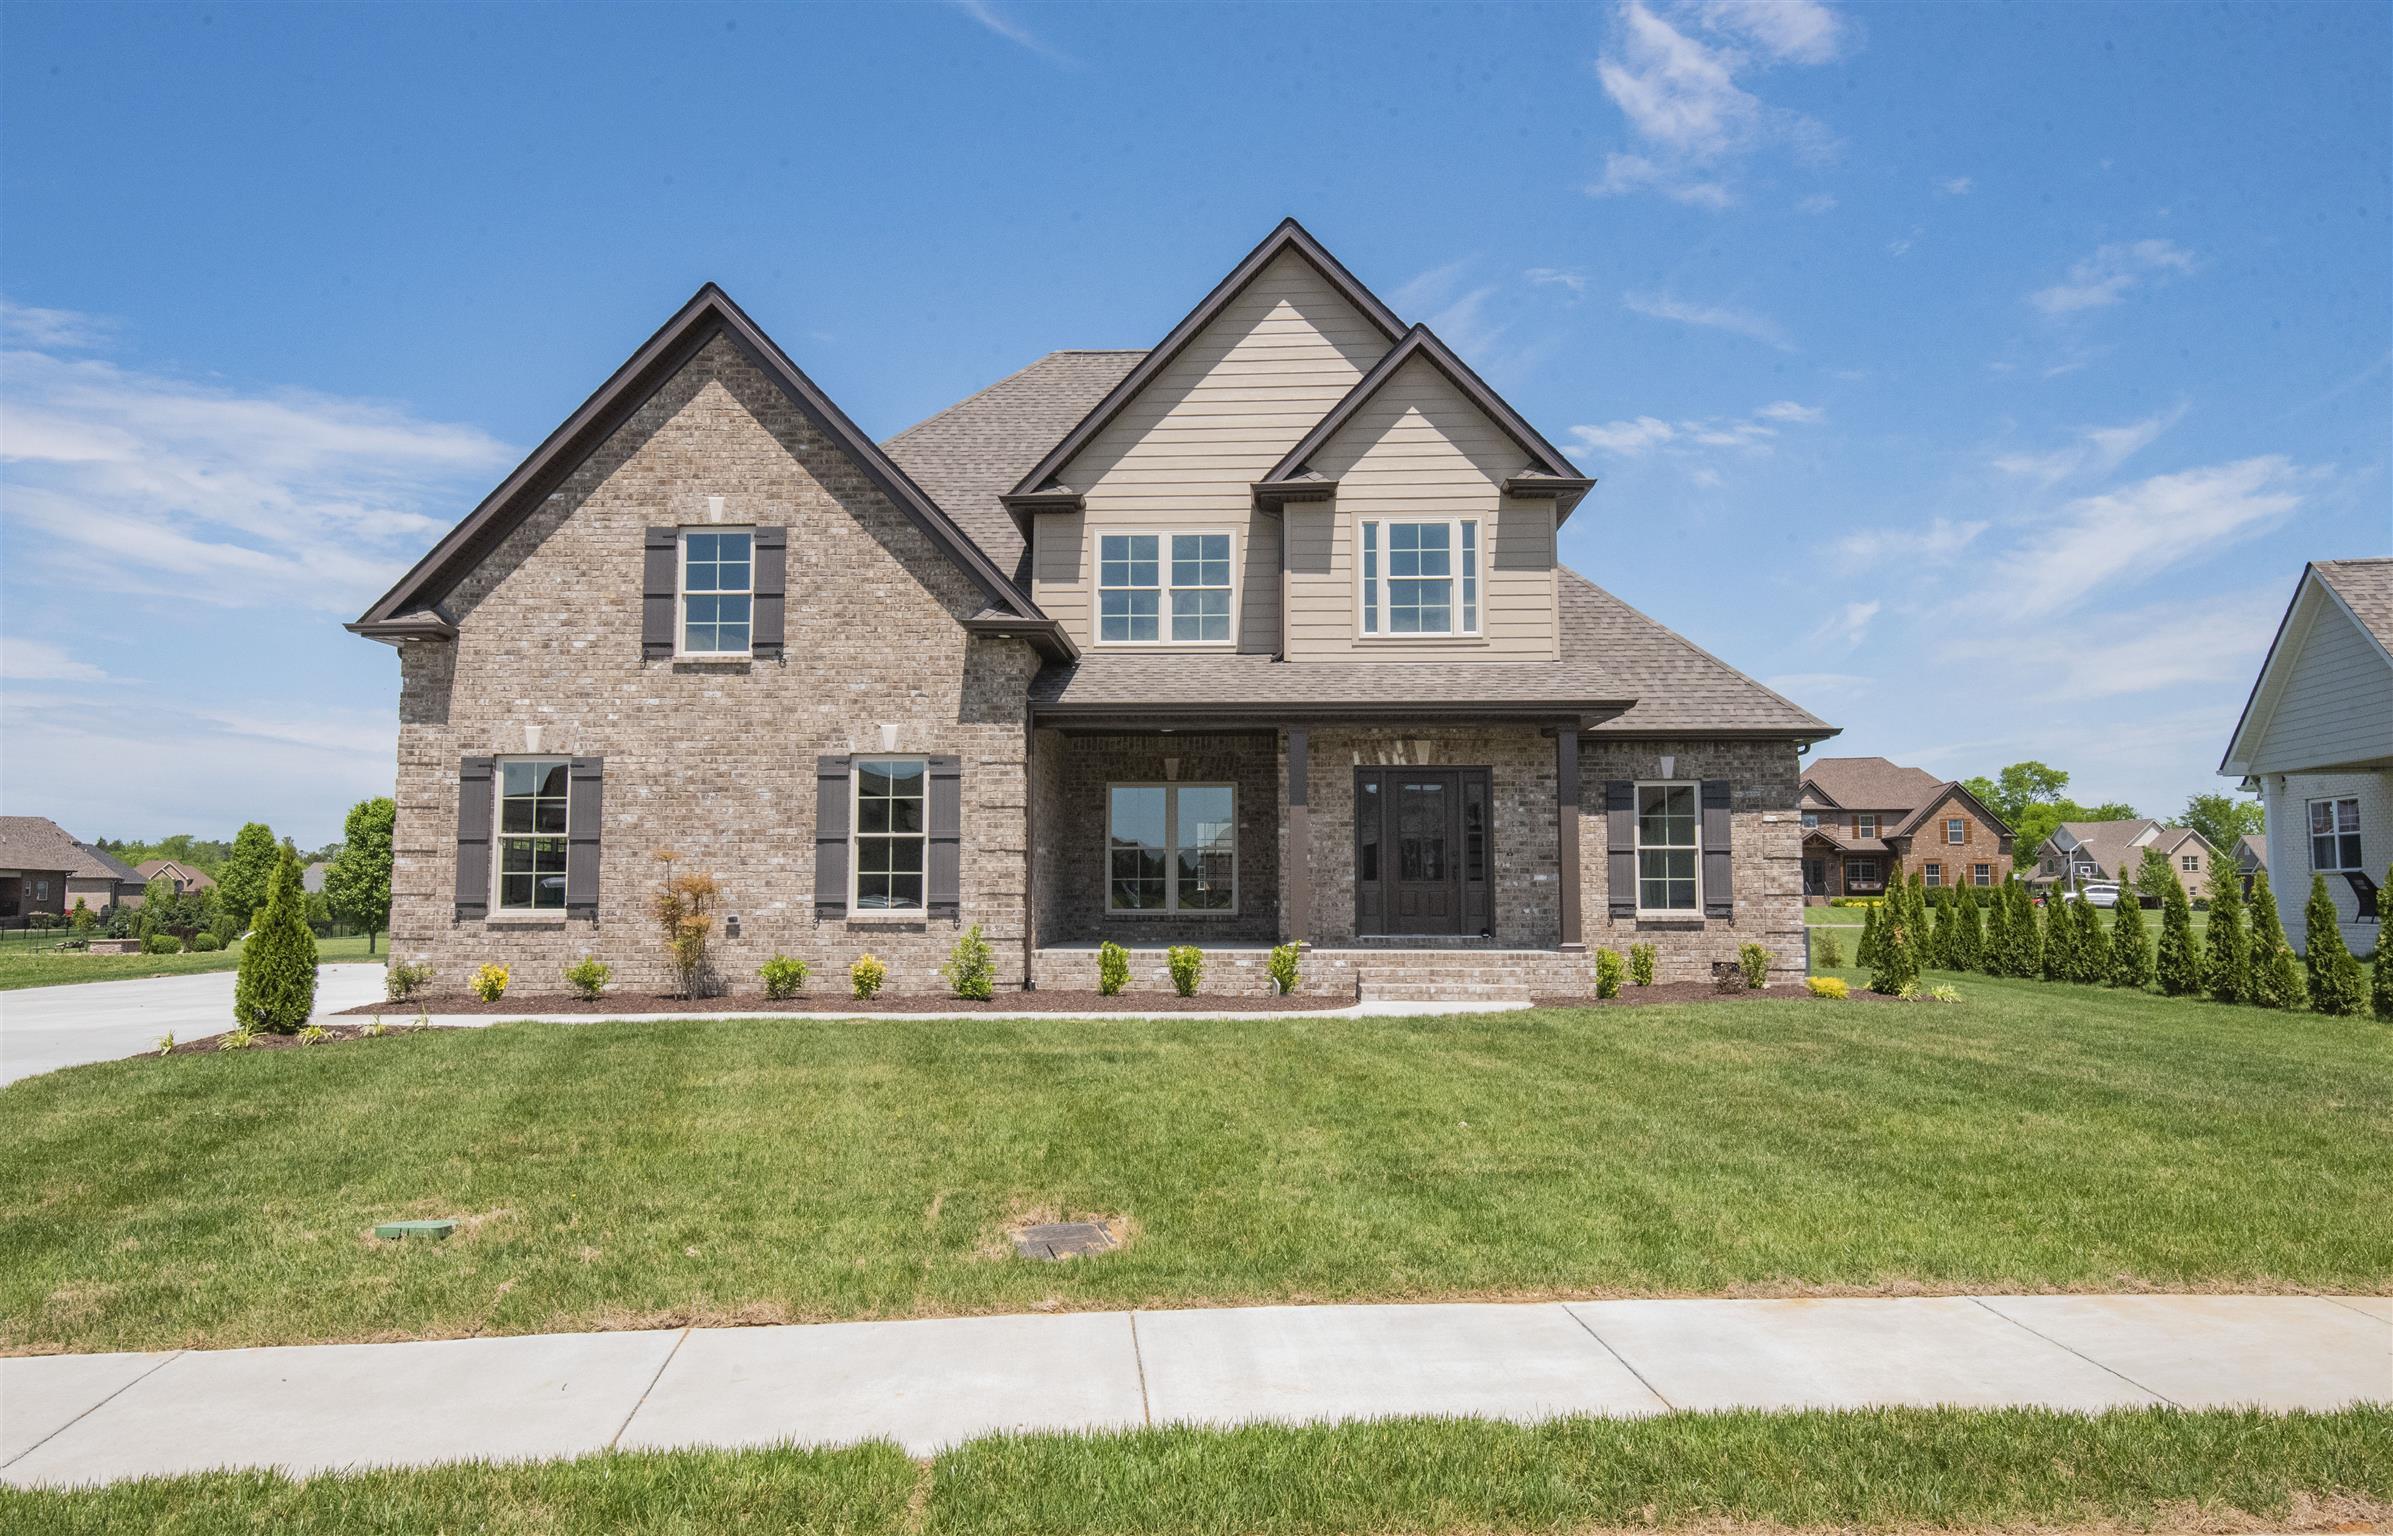 2808 Earline Way, Murfreesboro, TN 37128 - Murfreesboro, TN real estate listing